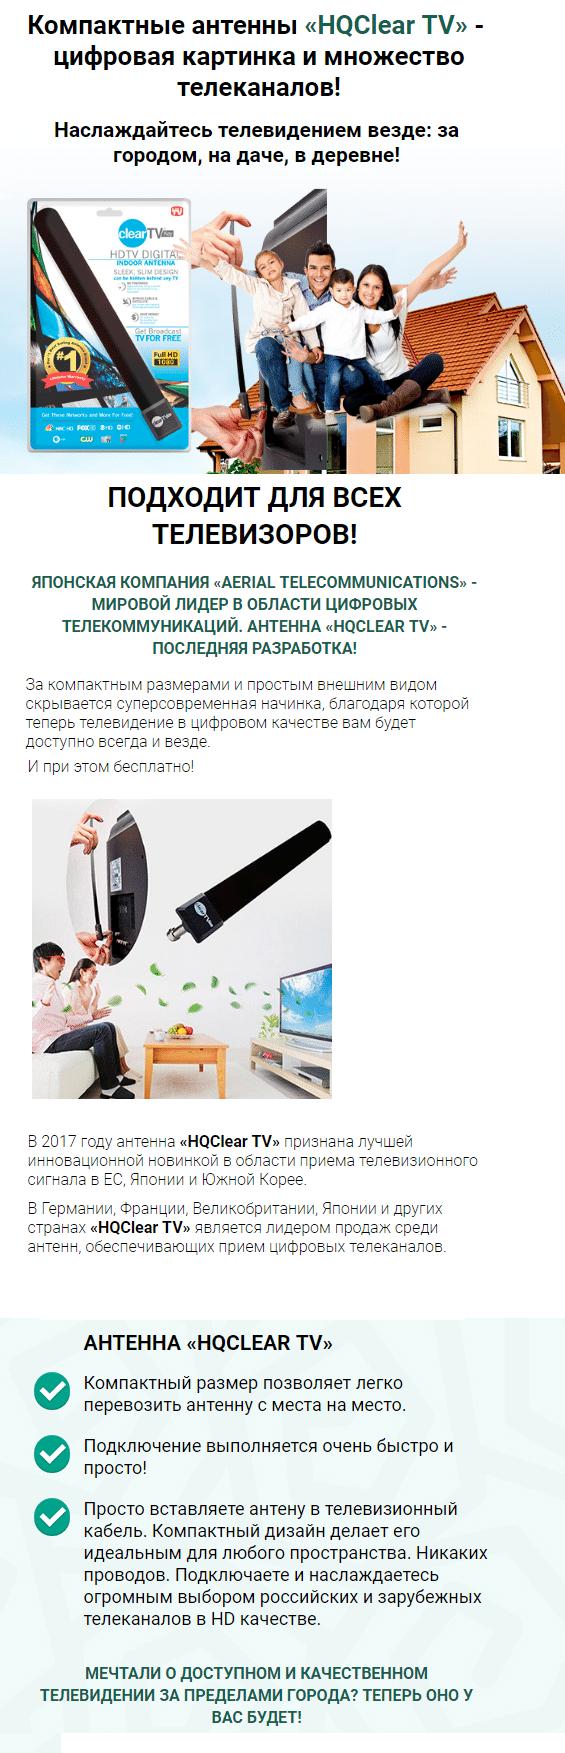 Телевизионная антенна HQClearTv купить